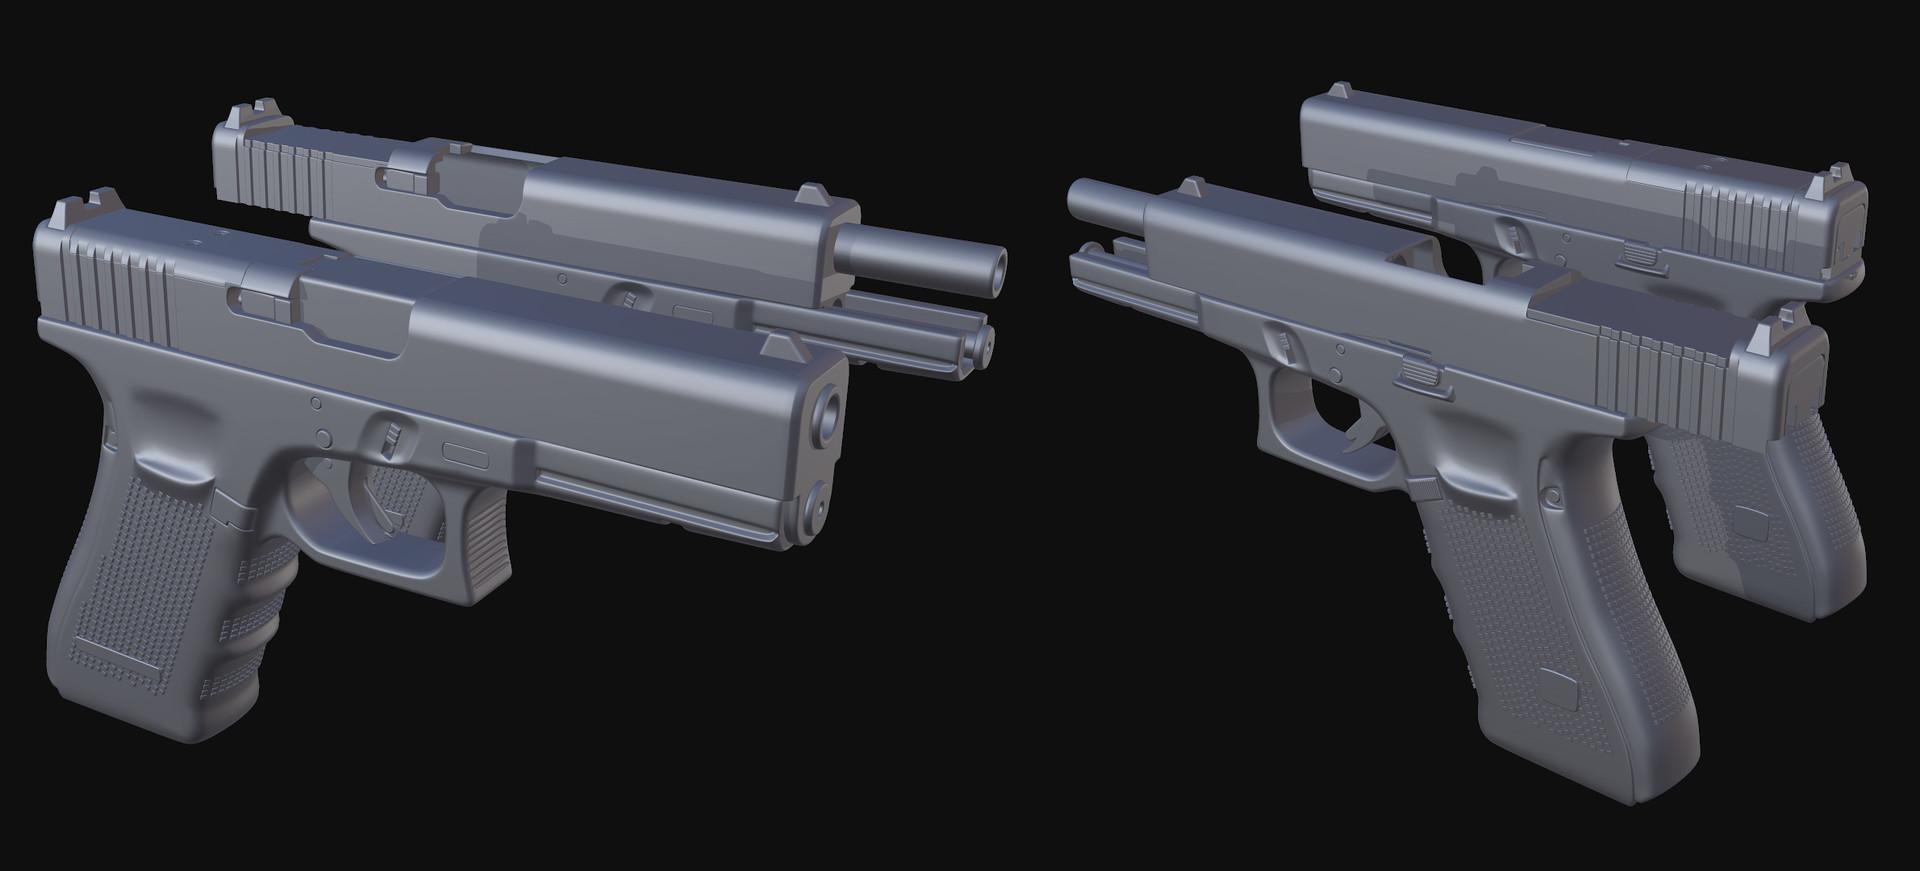 Daniel conroy glock 17 hp